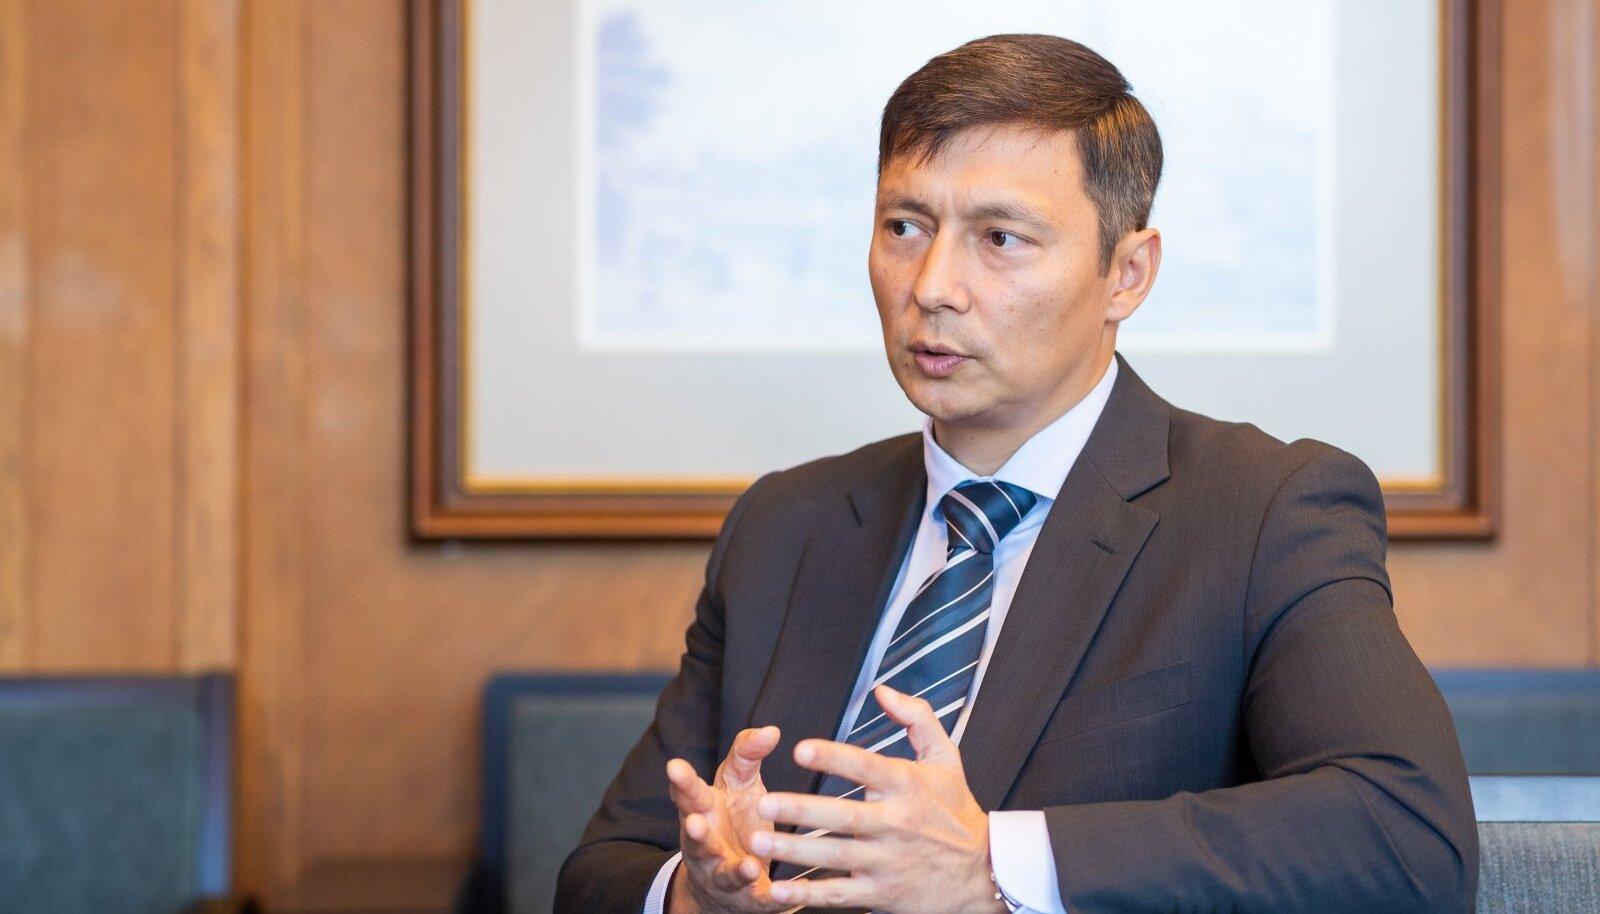 Mihhail Kõlvart, Tallinna linnapea.